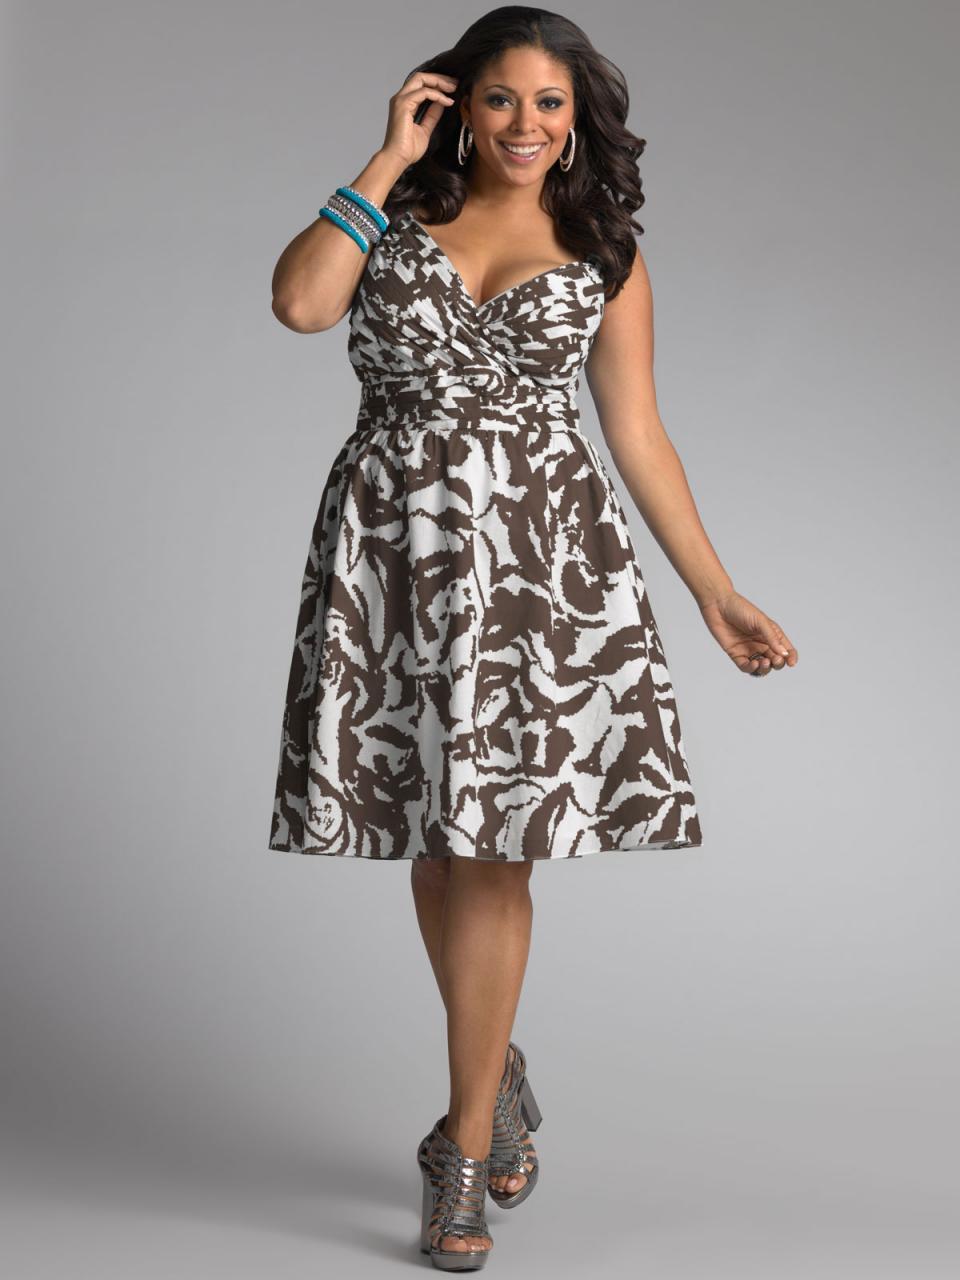 Tips for choosing plus size summer dresses